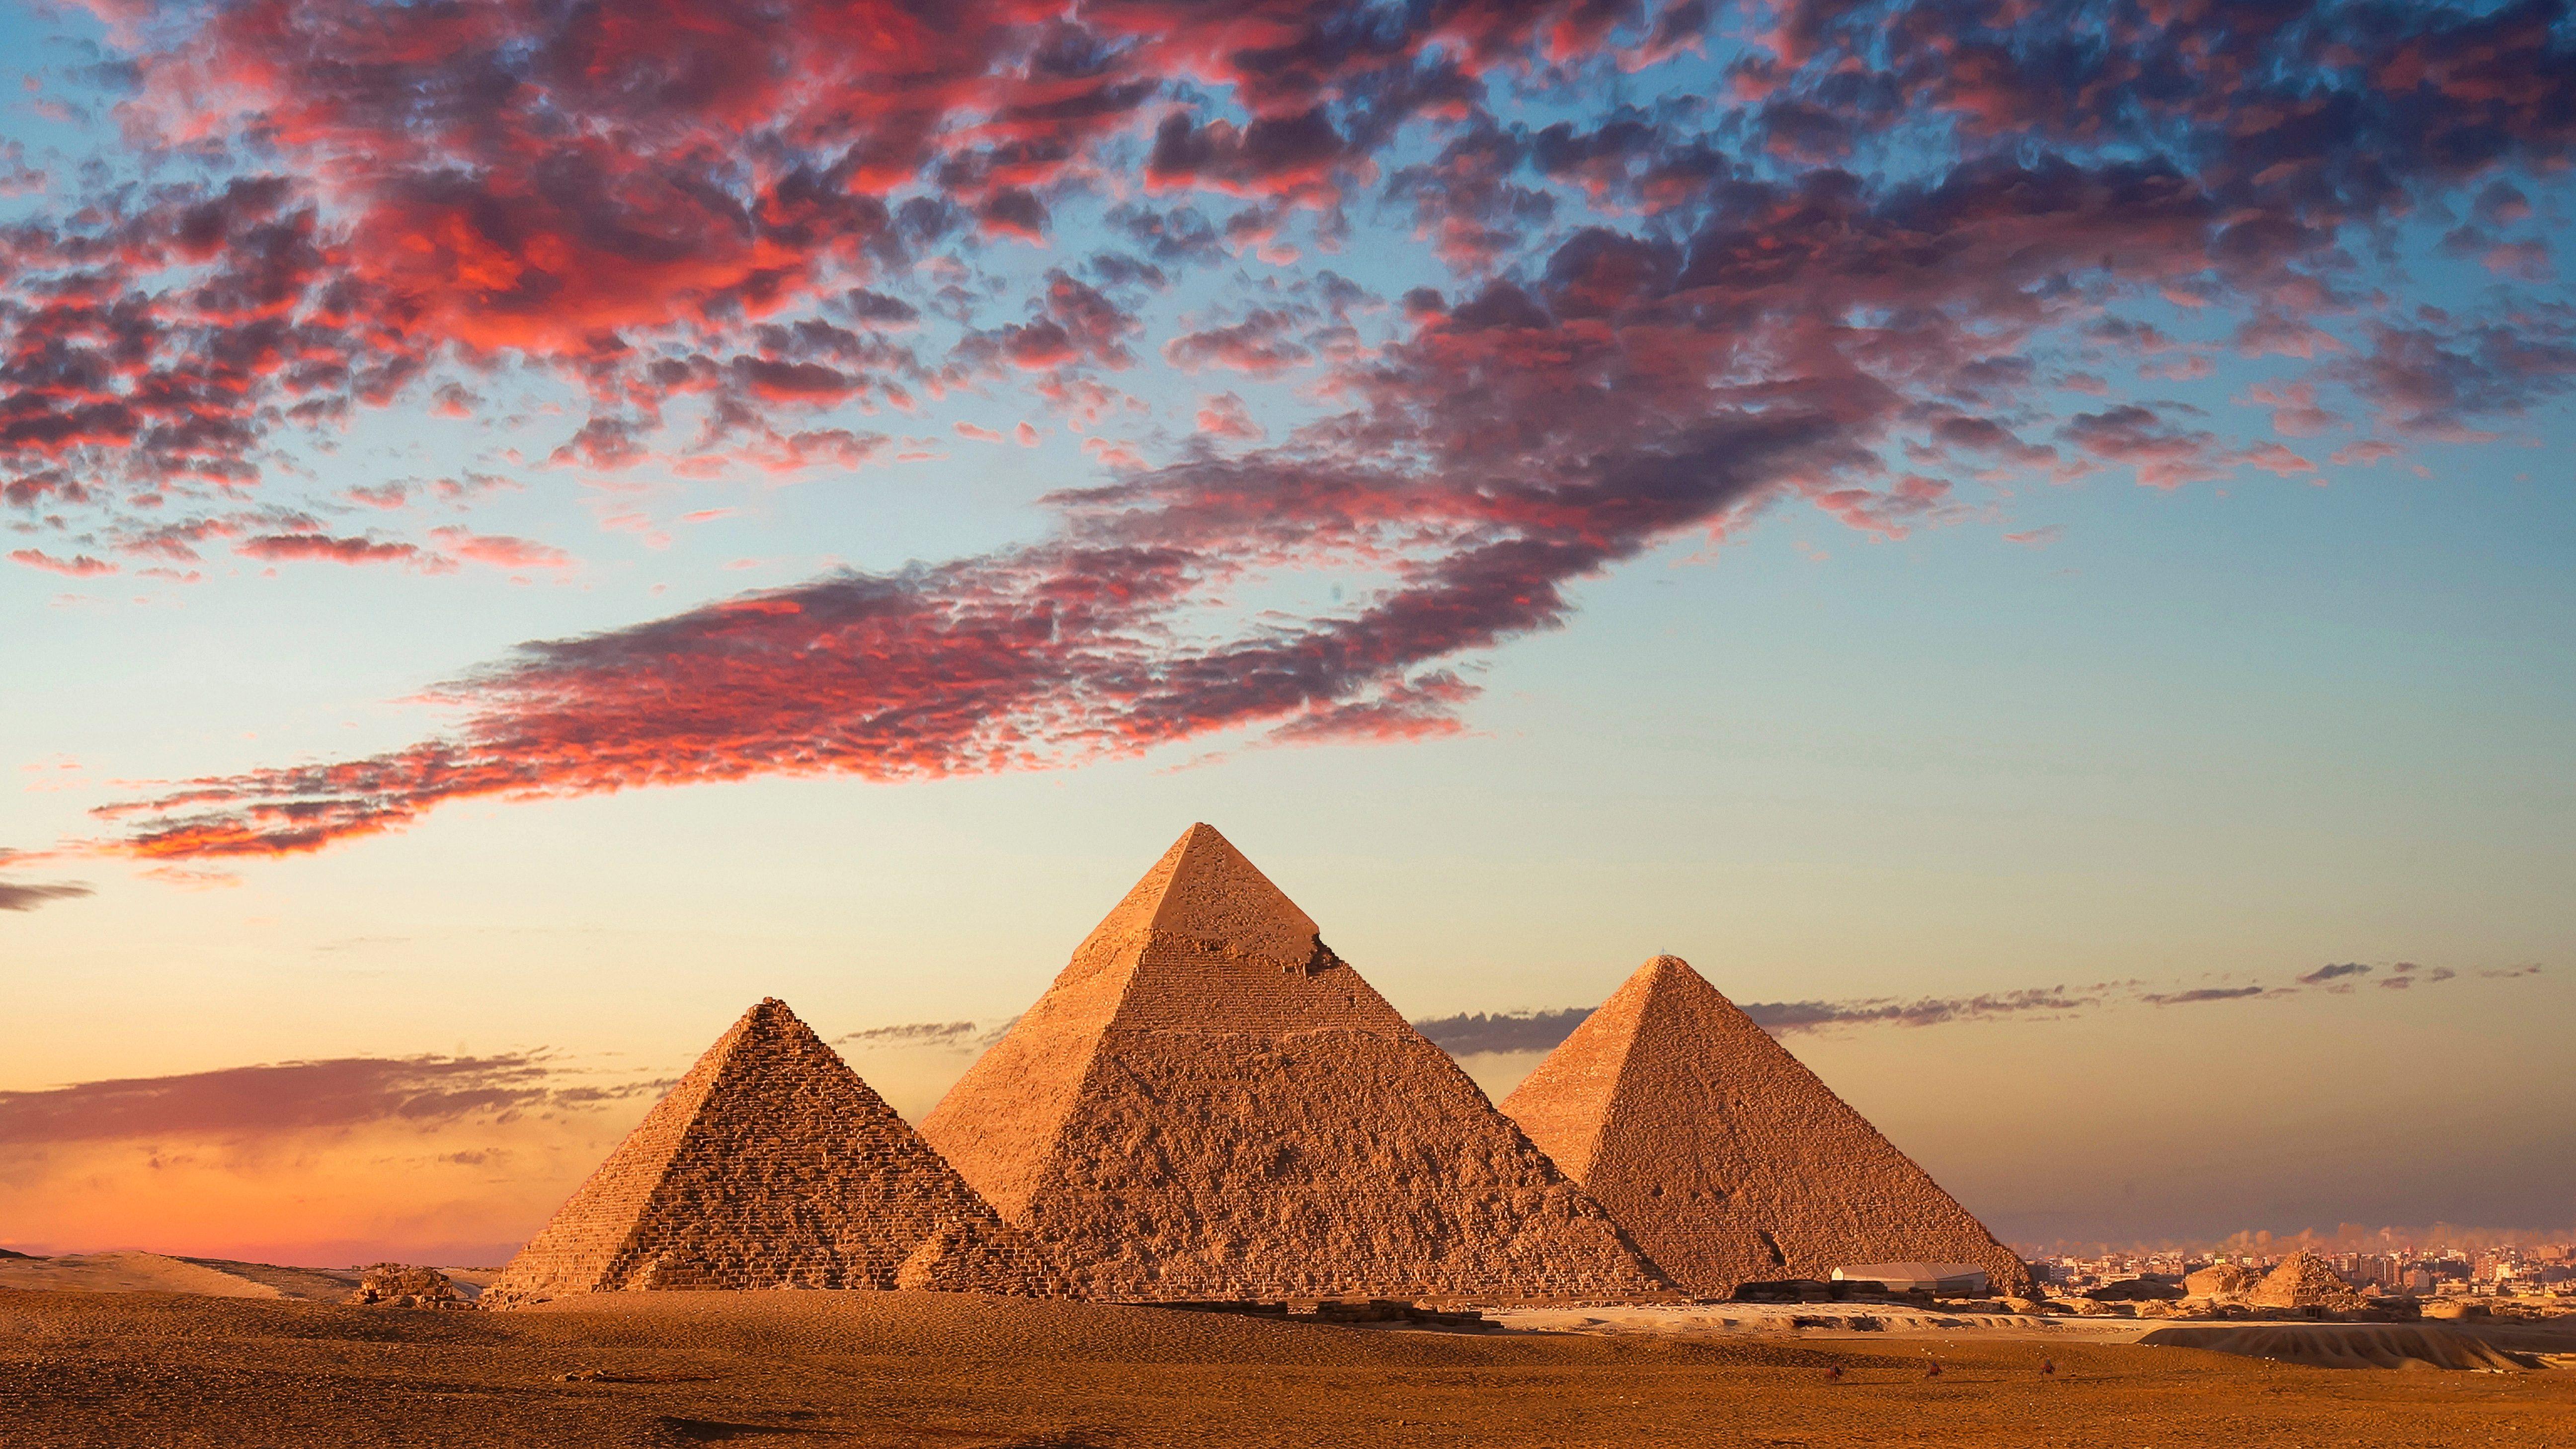 Sunset at the Pyramids, Giza, Cairo, Egypt